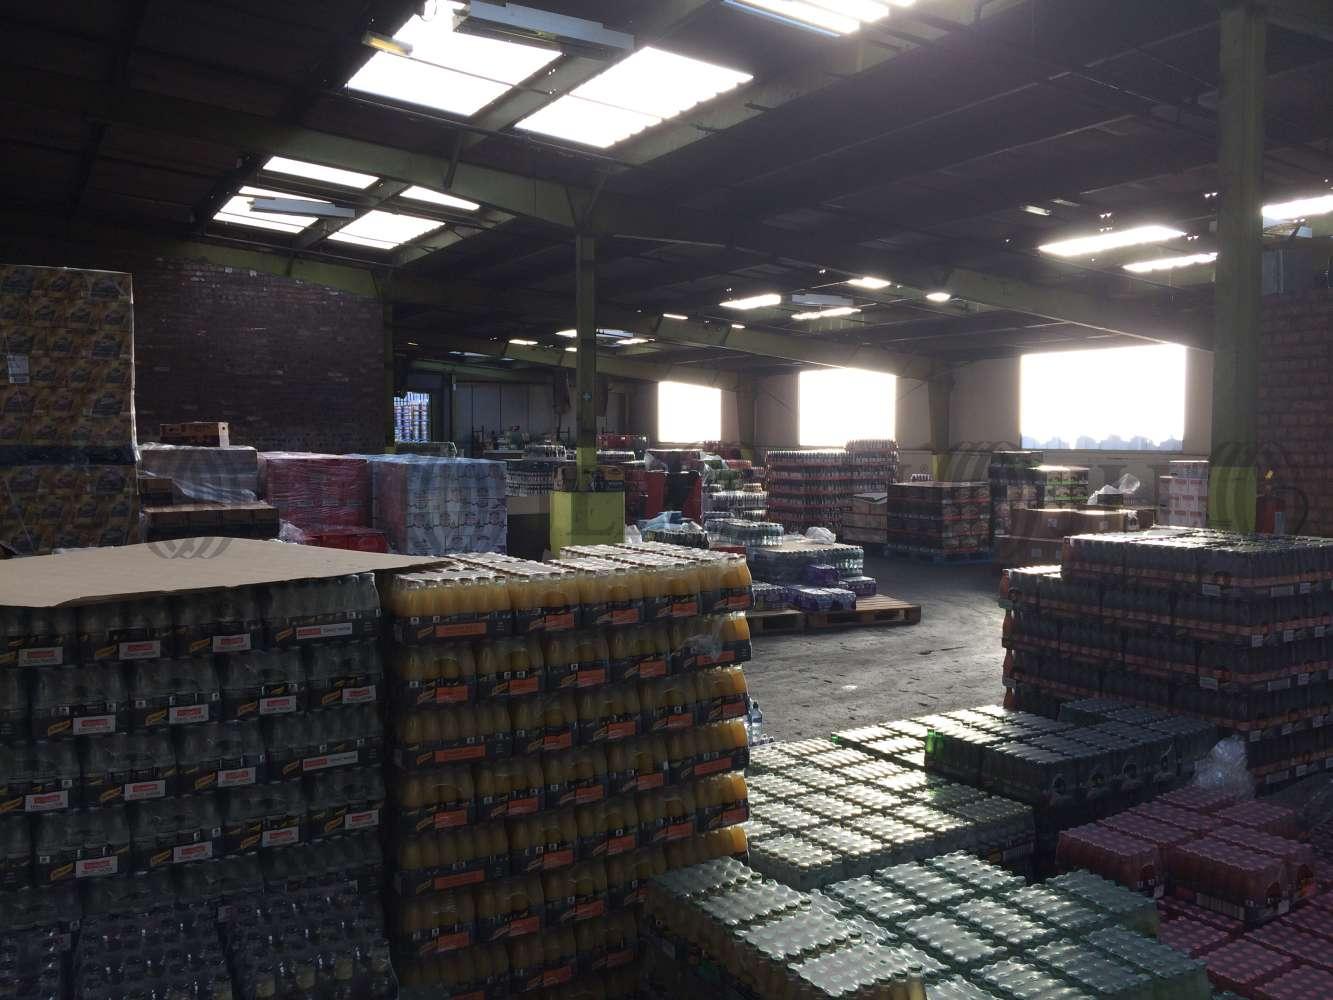 Industrial Dunbar, EH42 1RS - Belhaven Brewery Site - 0106